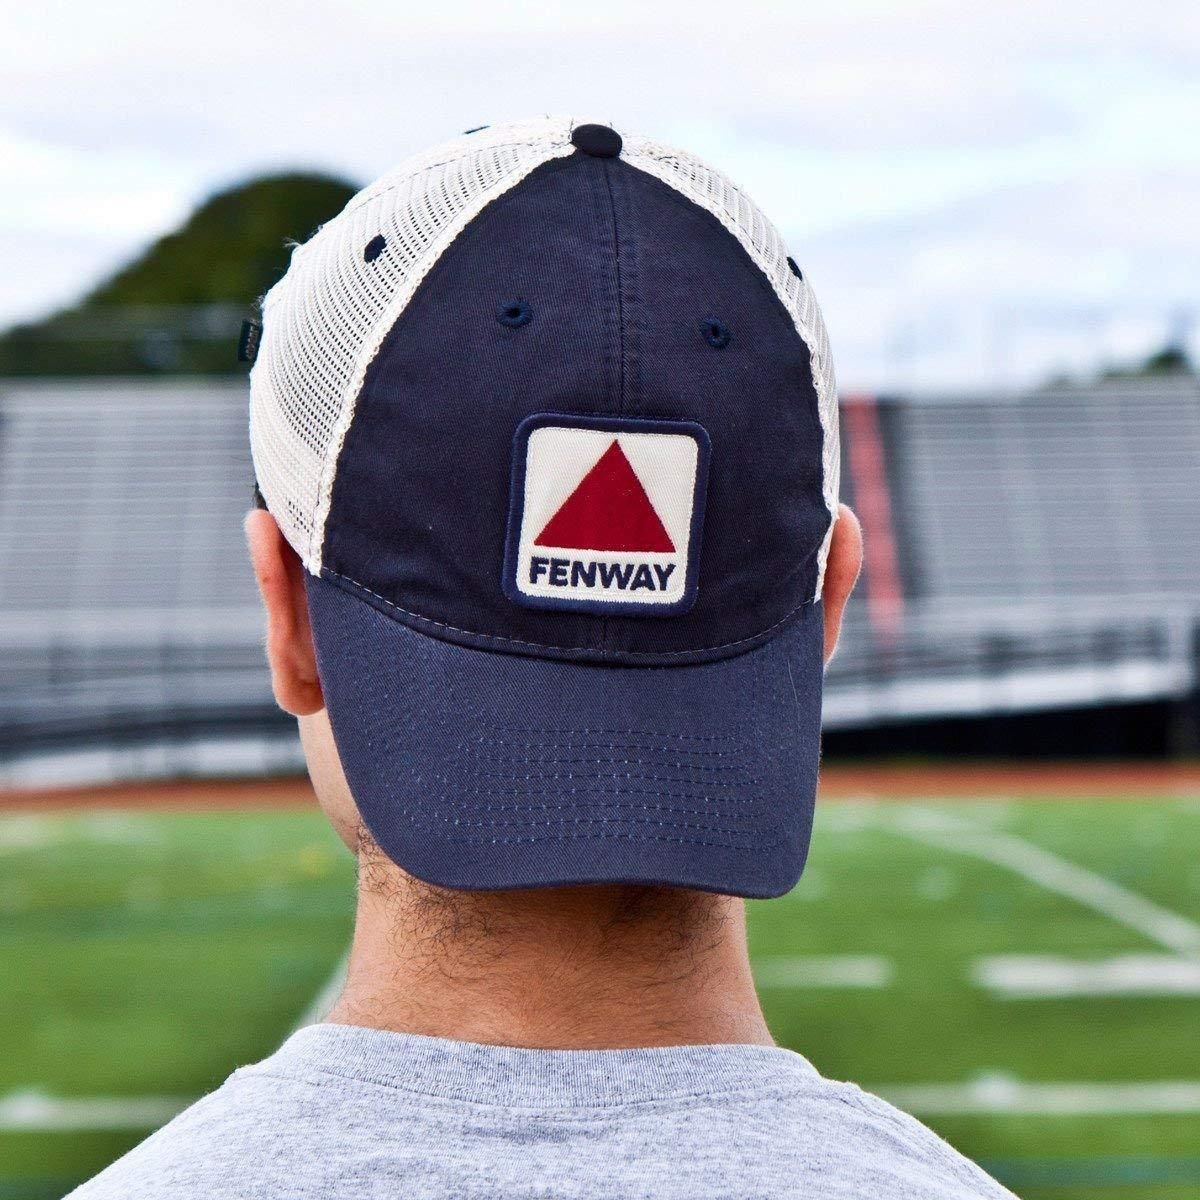 ce0b4c841 Chowdaheadz Fenway Patch Townie Mesh Trucker Navy Hat at Amazon Men's  Clothing store: